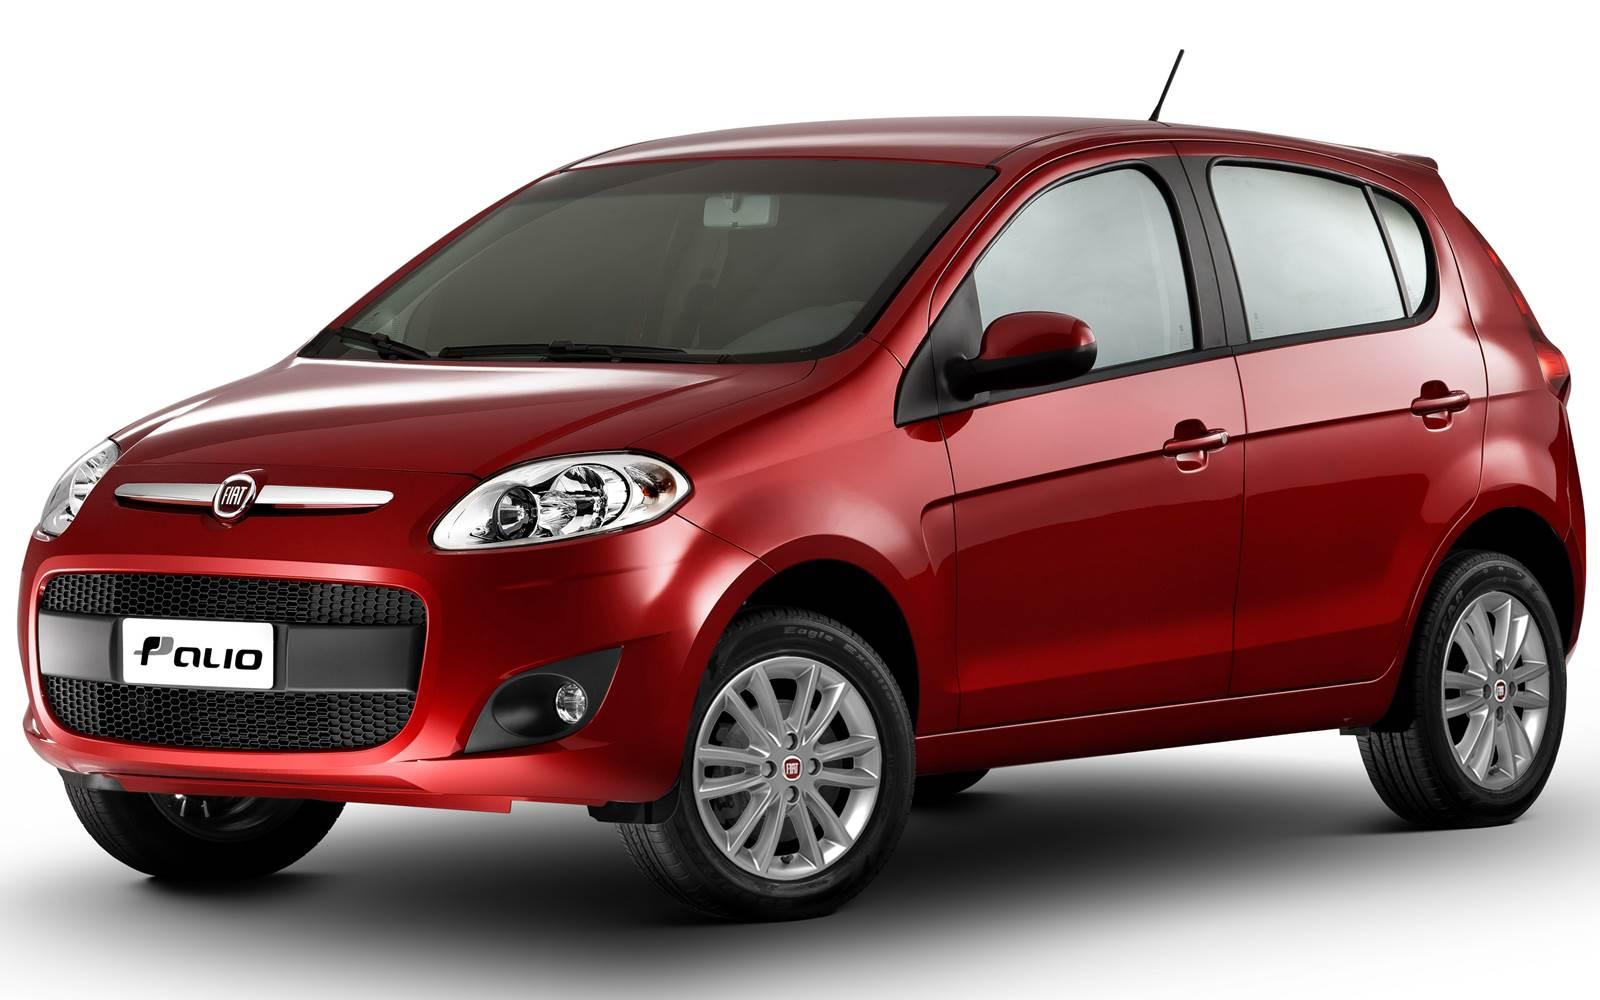 Novos fiat palio e siena 2014 fotos e tabela de pre os for Fiat attractive 2016